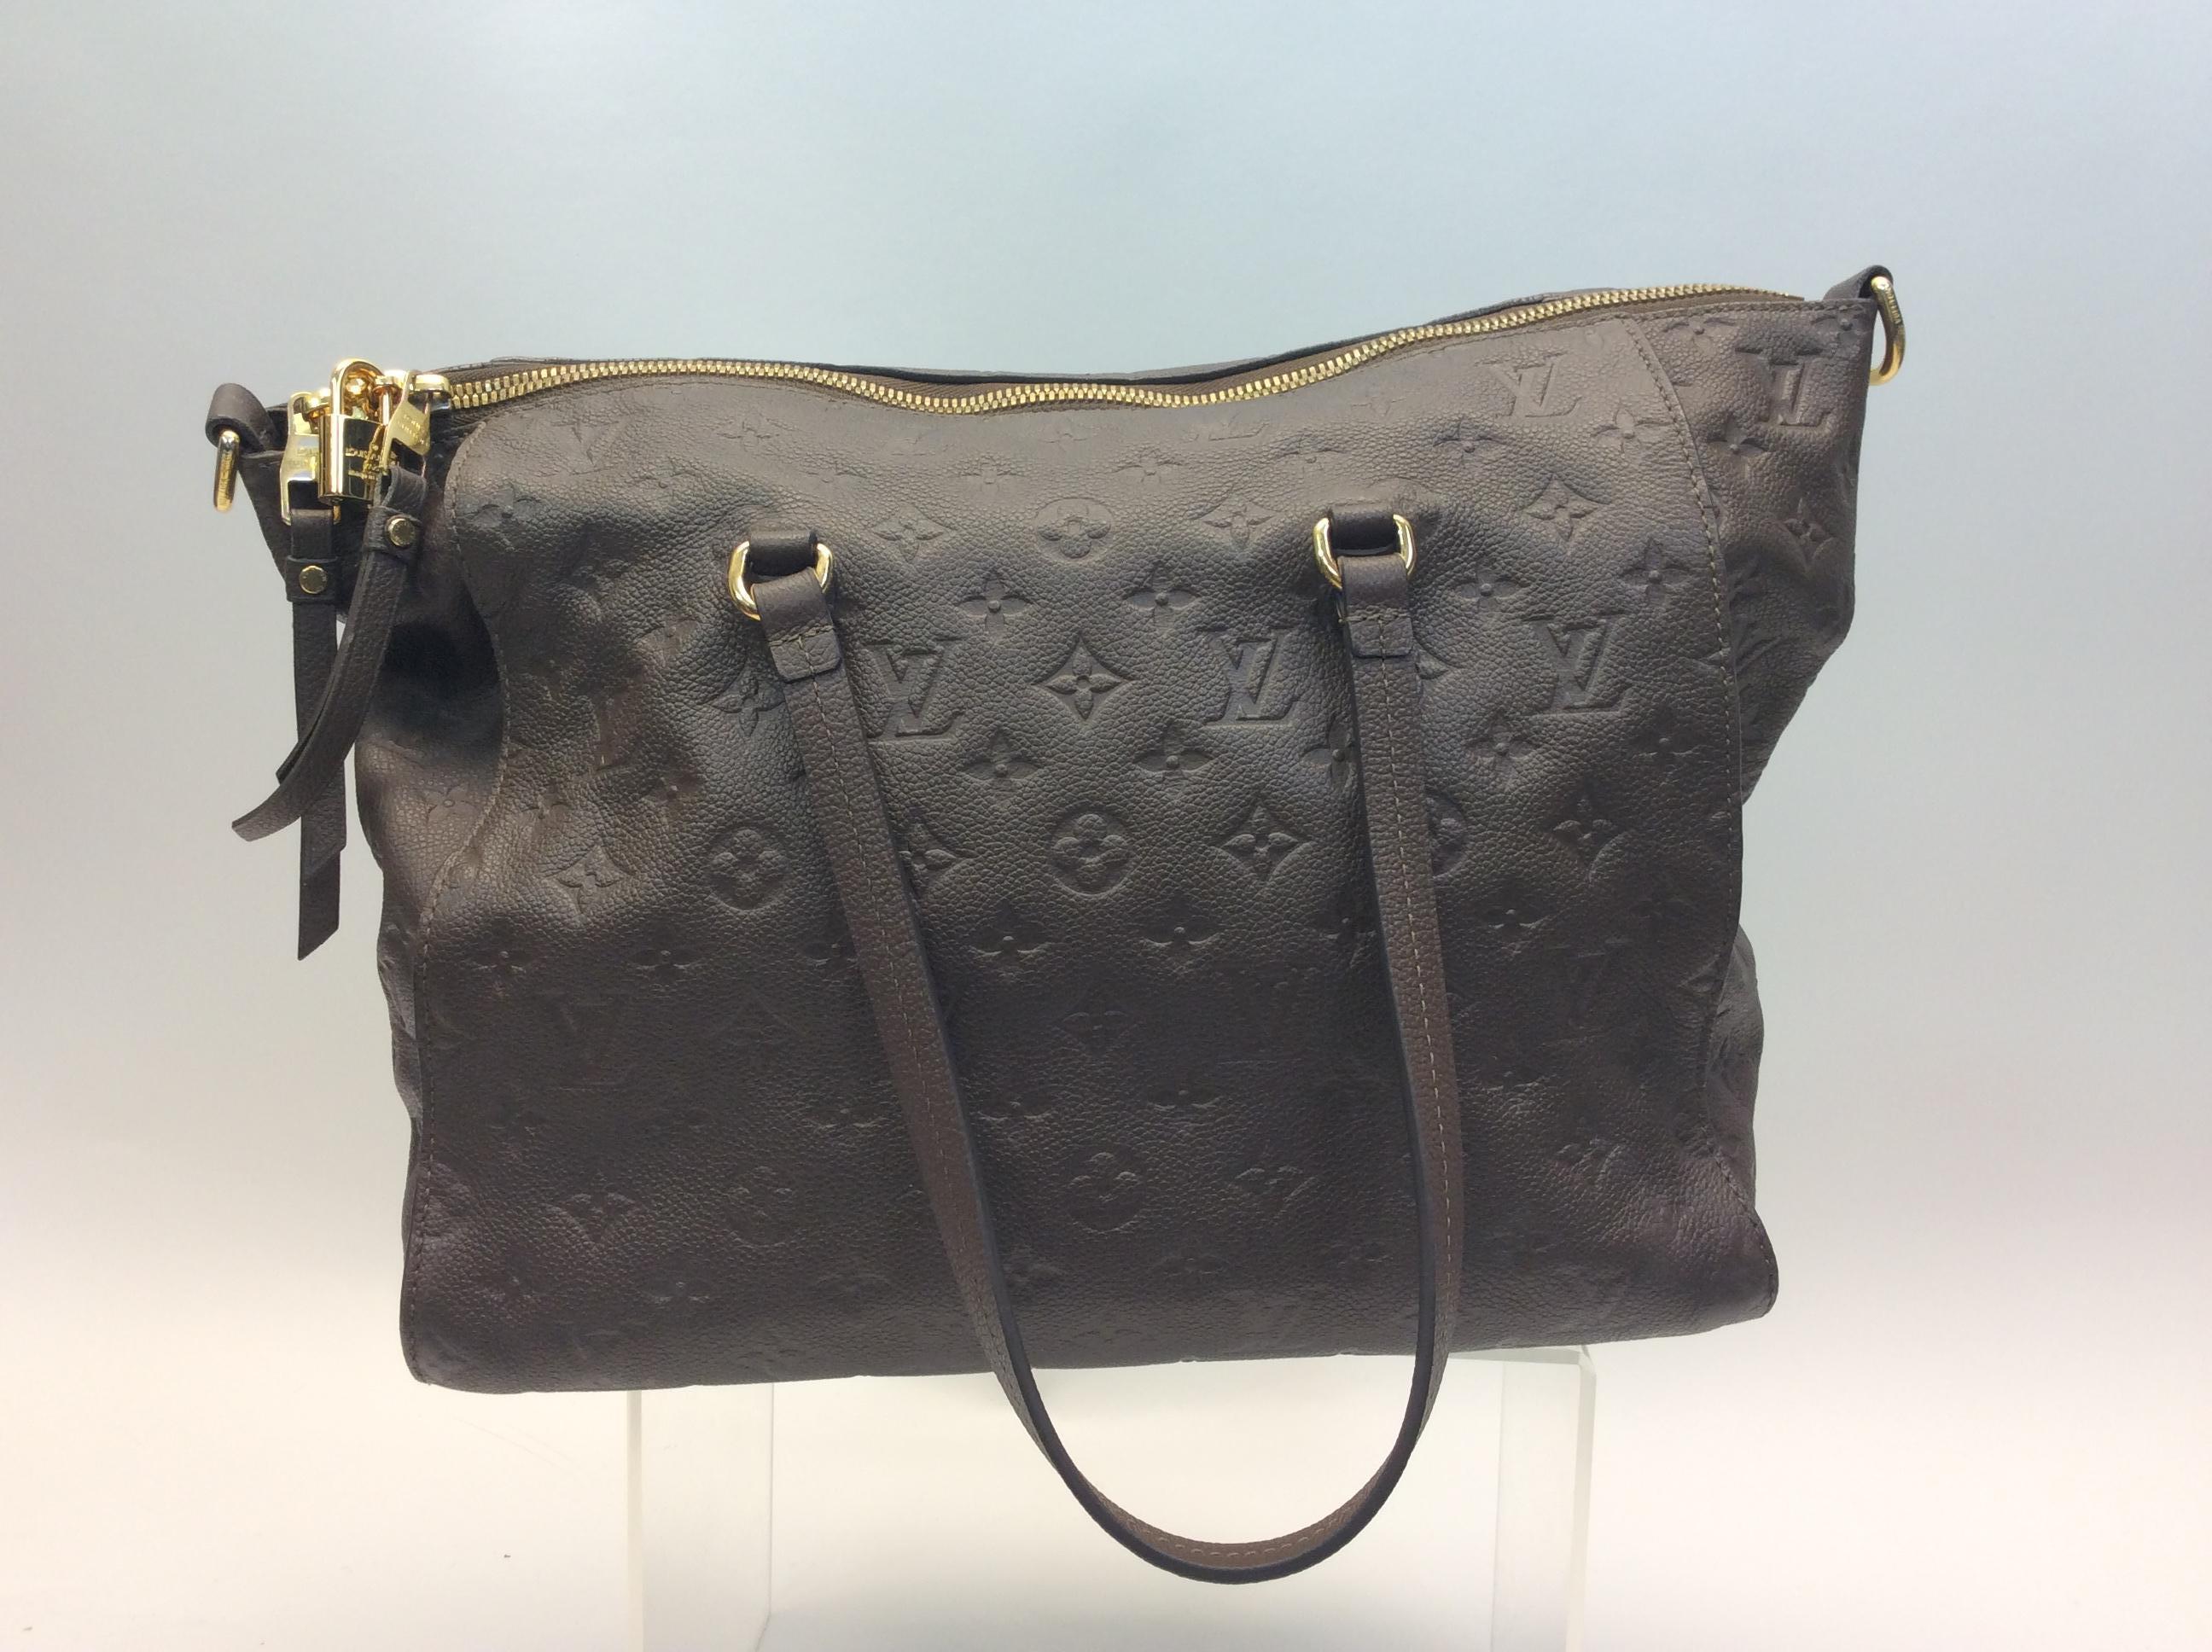 73239dec43 Louis Vuitton Taupe Monogram Embossed Leather Tote